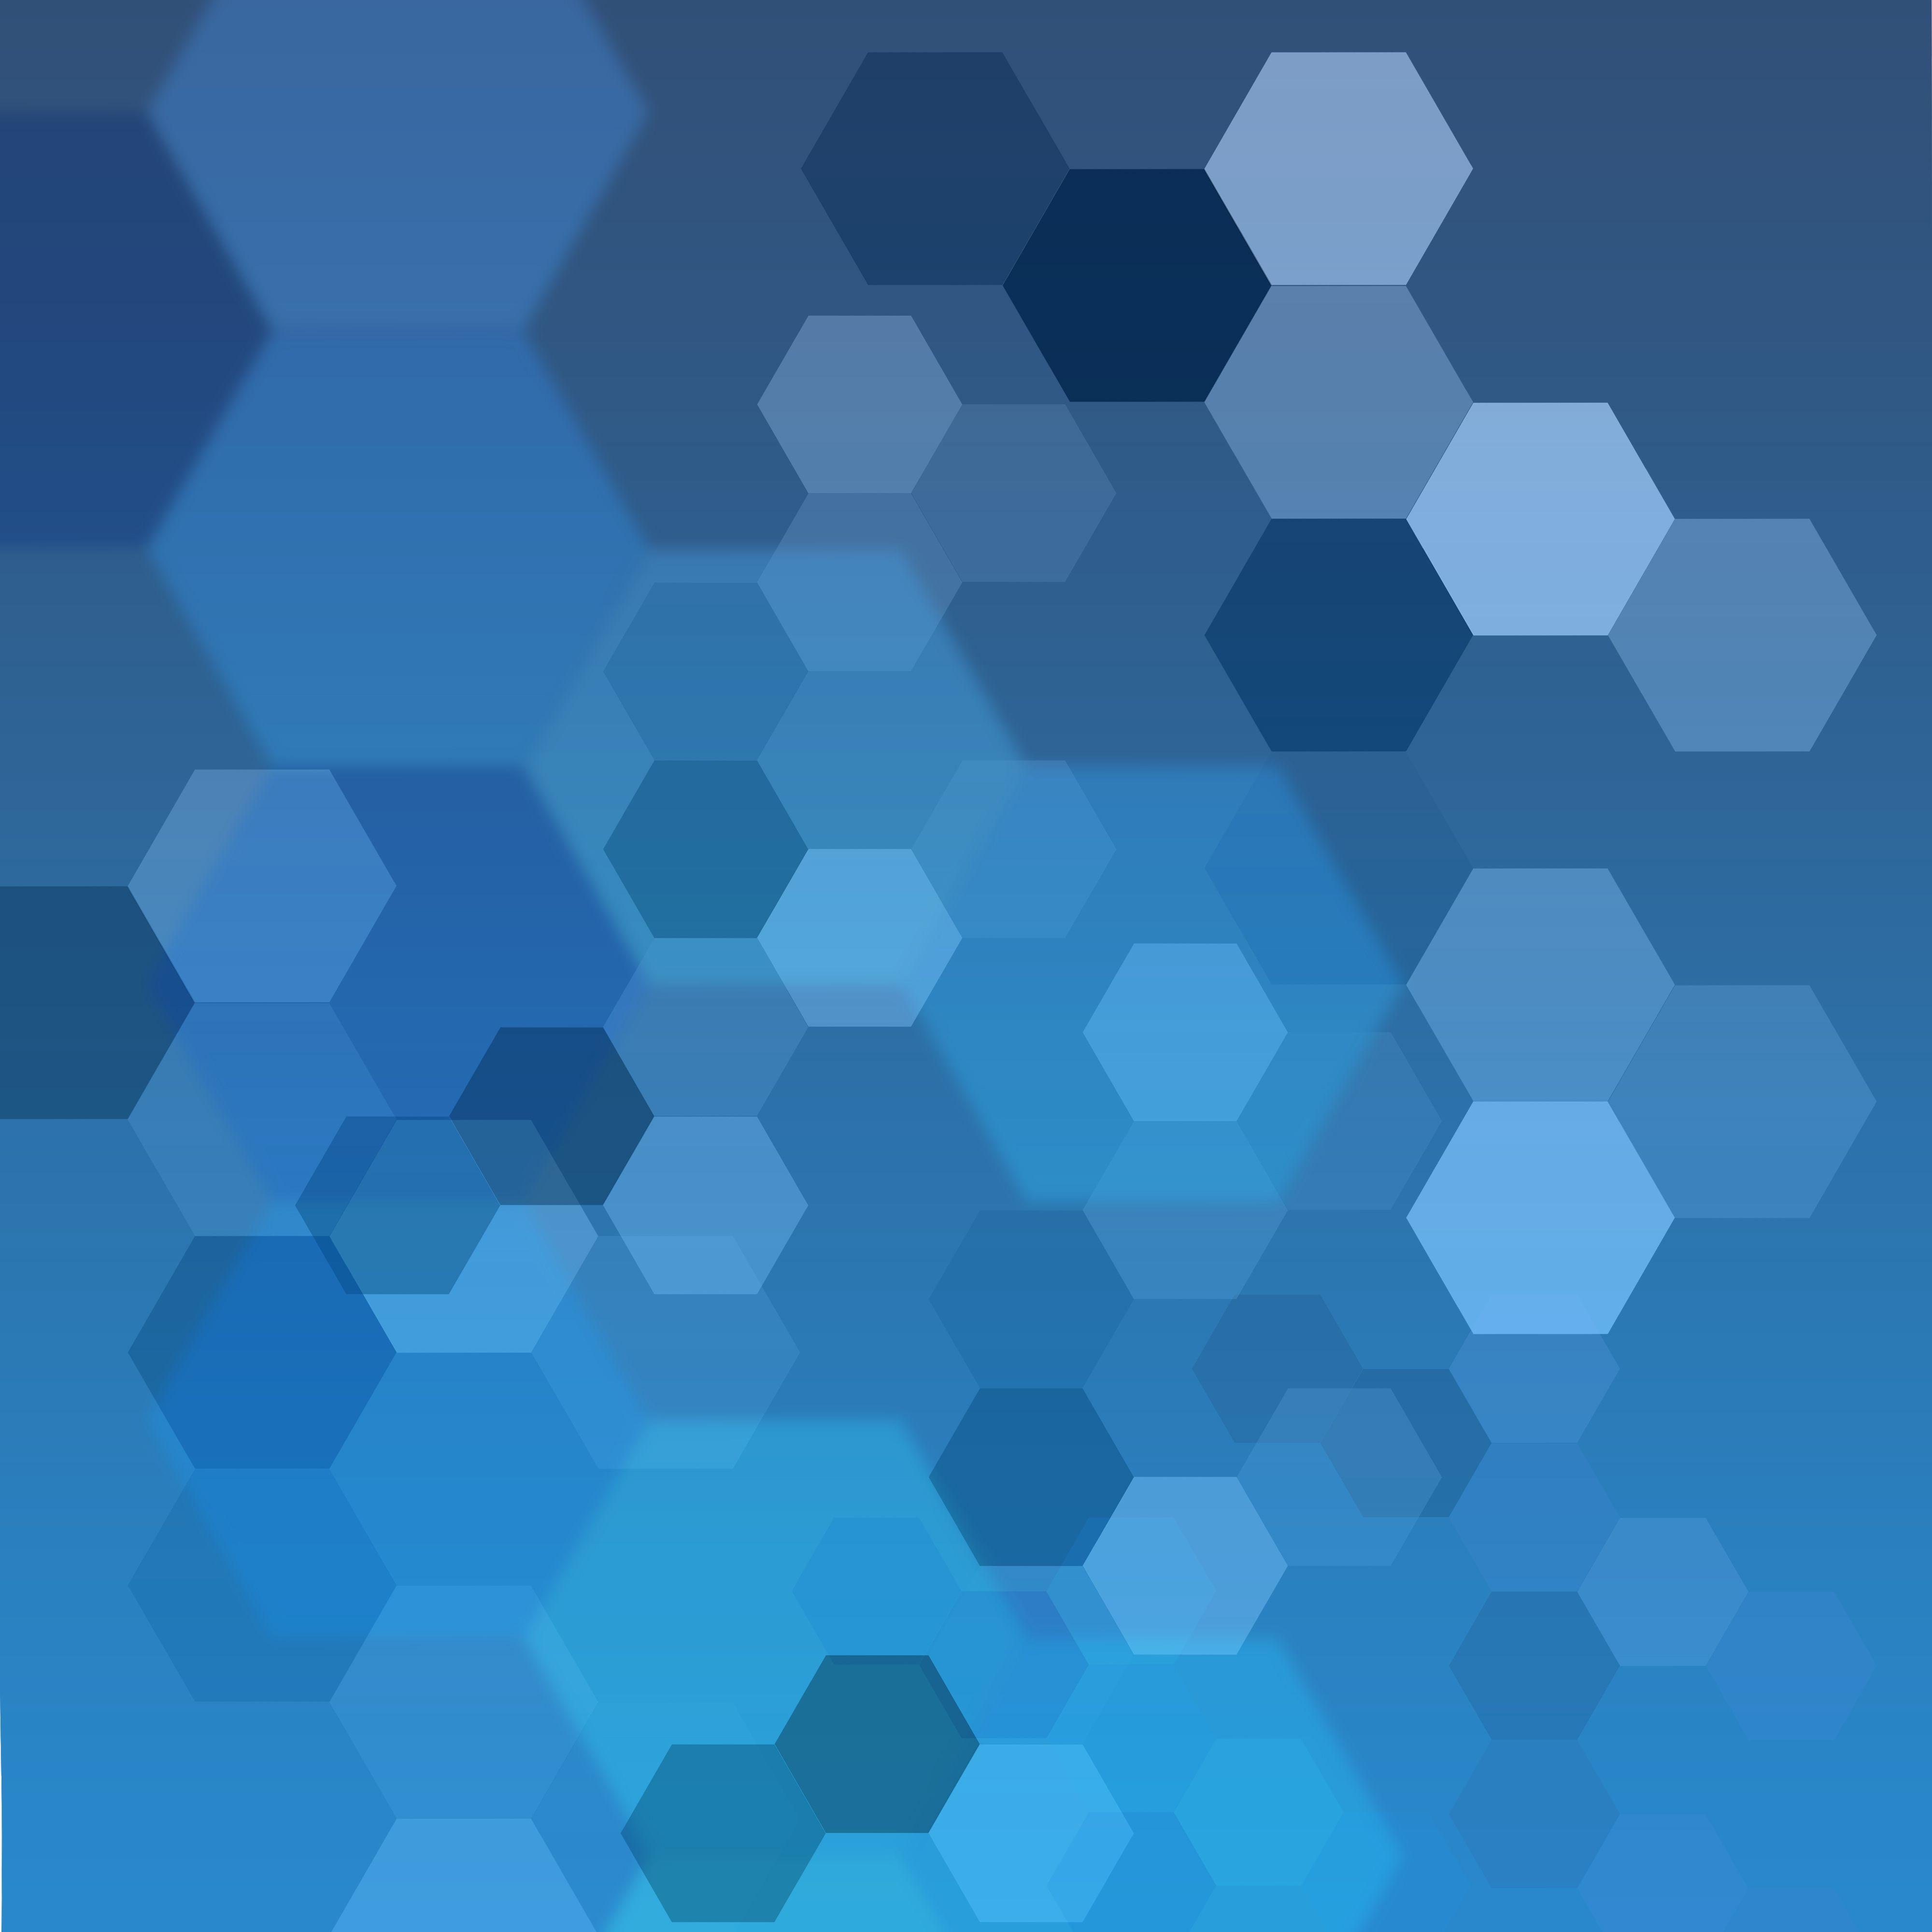 Honeycomb Blue Blue Pictures Honeycomb Wallpaper Desktop Pictures